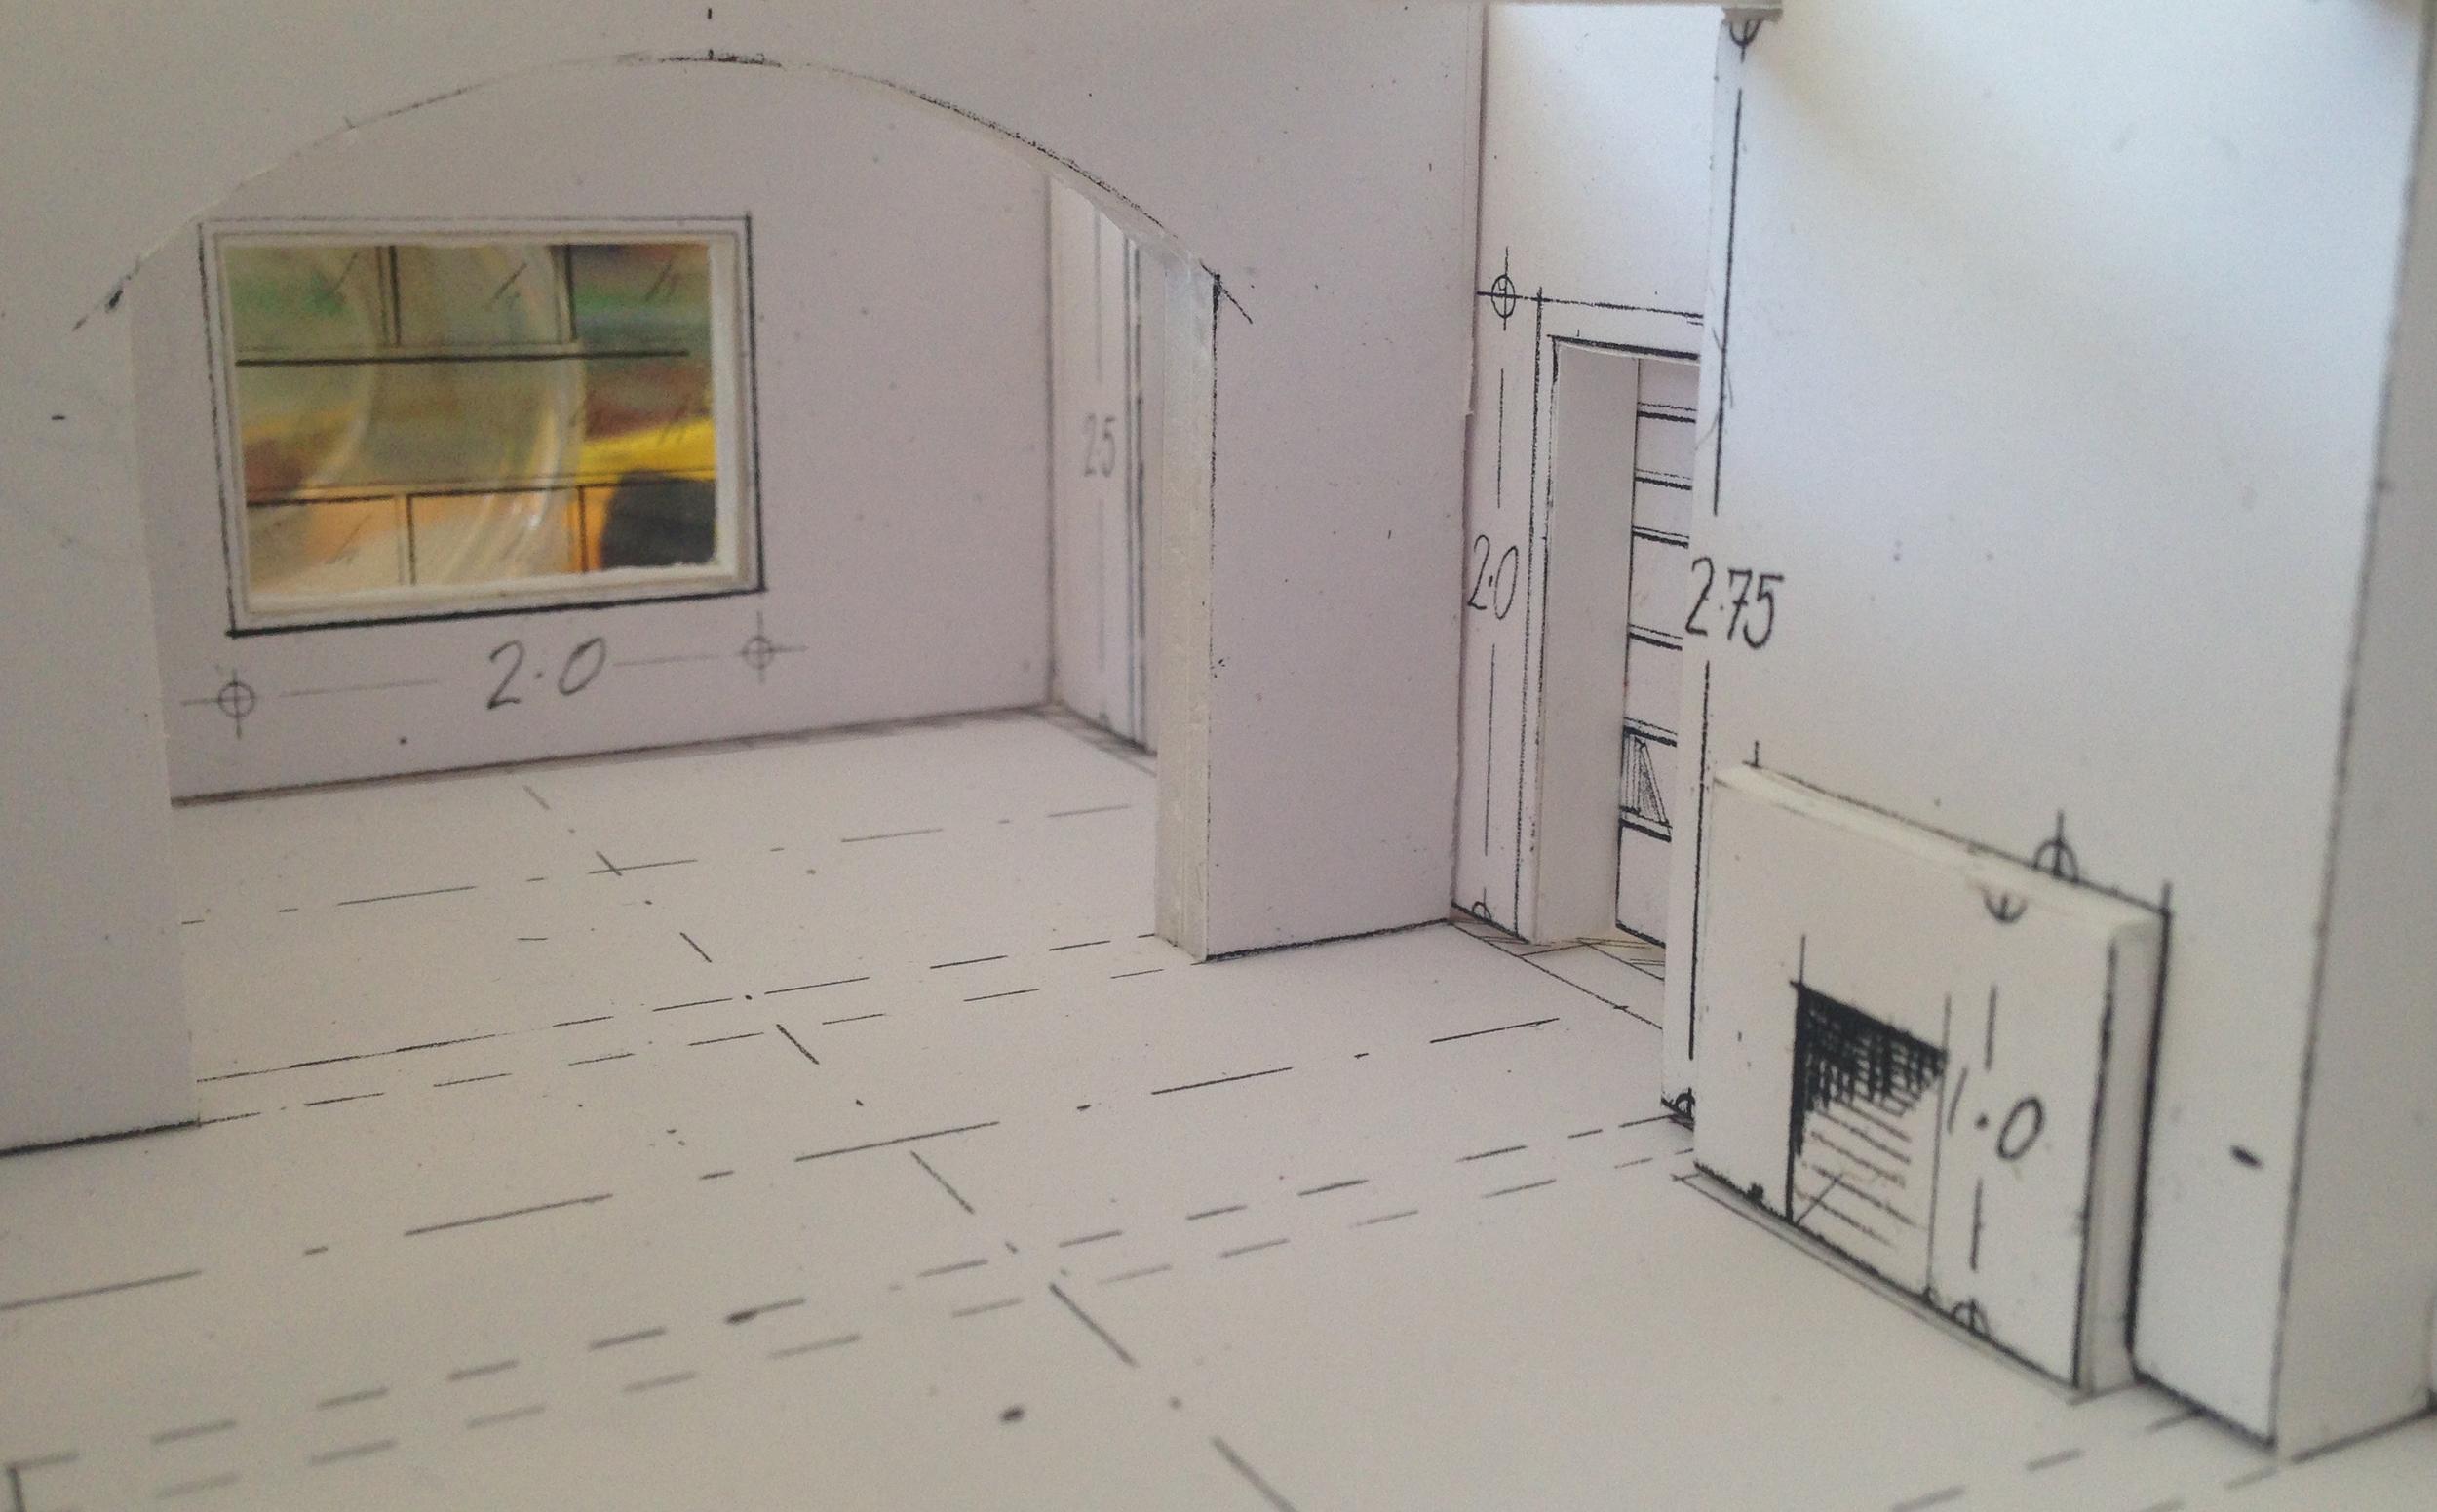 Interior of Modernist Apartment, foam board model